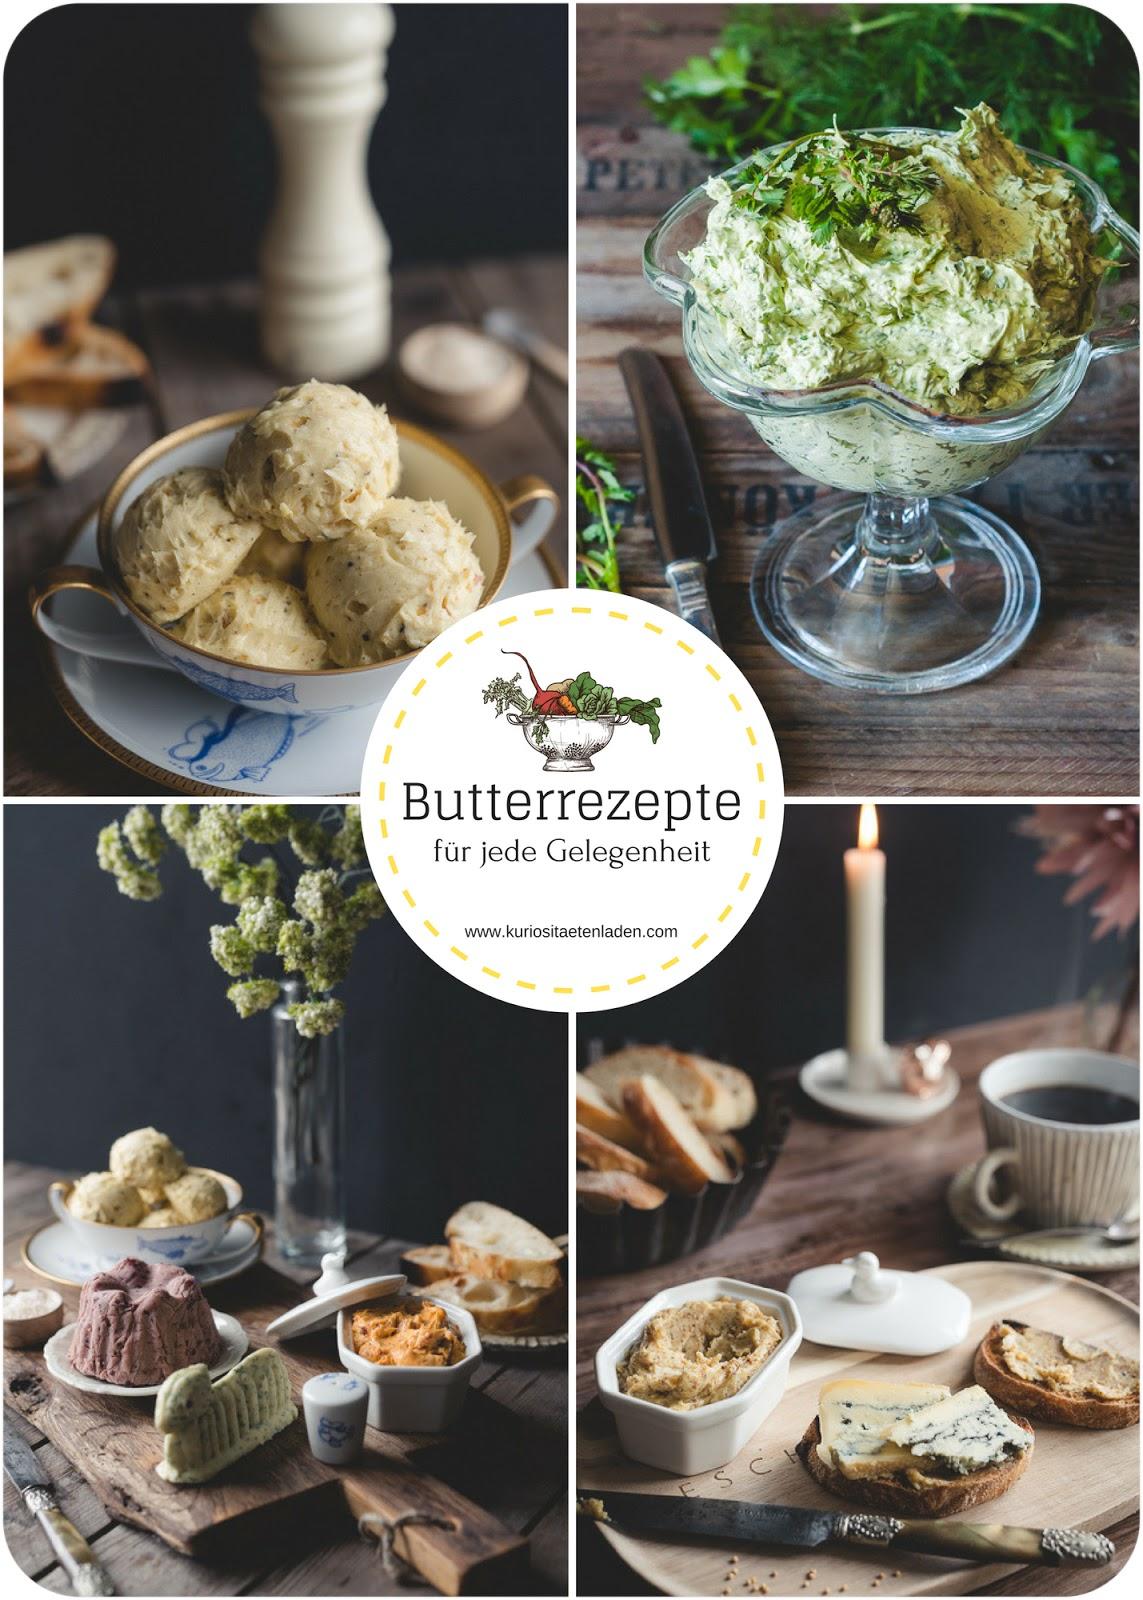 Kräuter-, Gewürz- und süße Butterrezepte